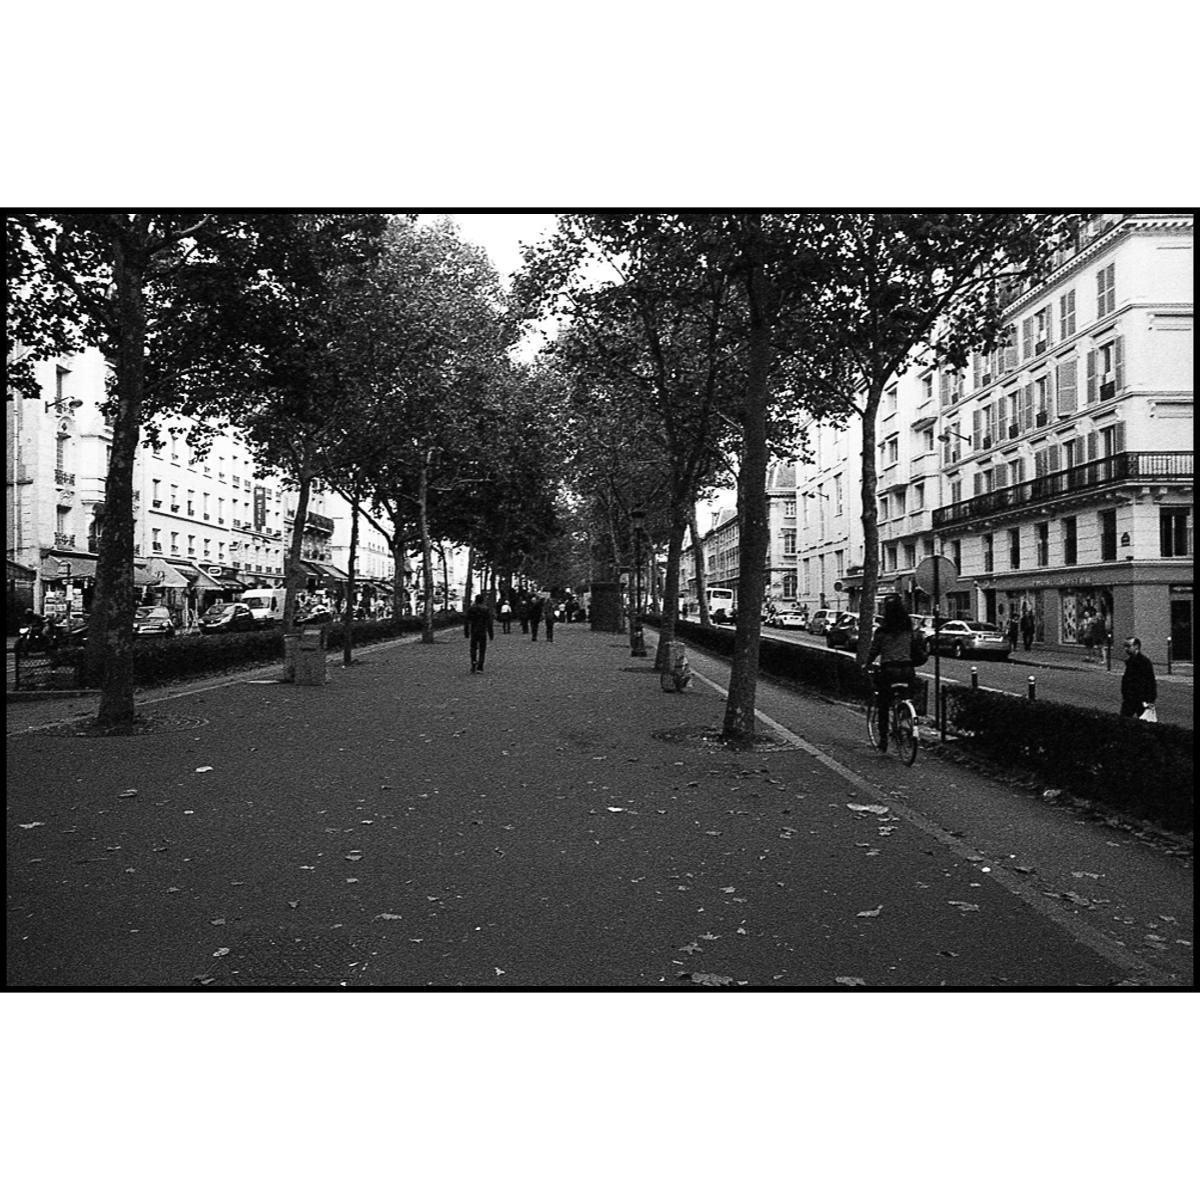 paris file-071.jpg